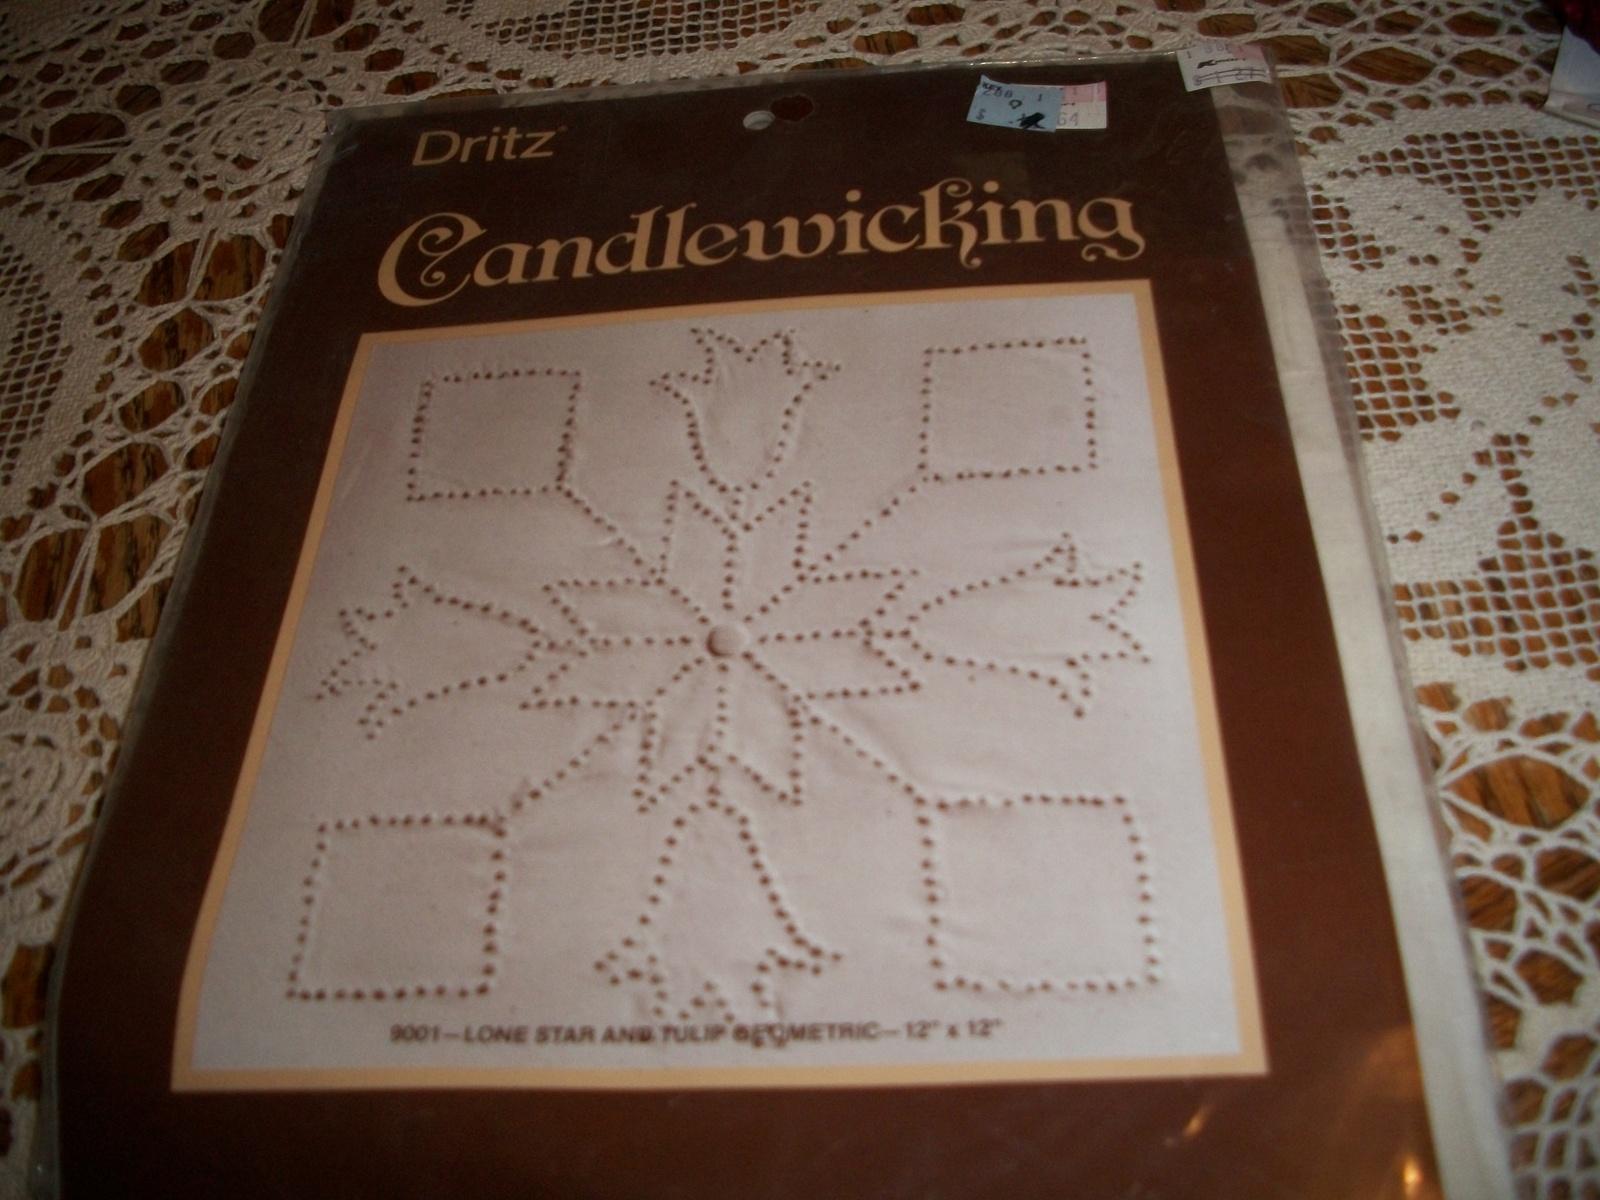 Dritz Candlewicking Kit 9001~Lone Star And Tulip Geometric - $14.00